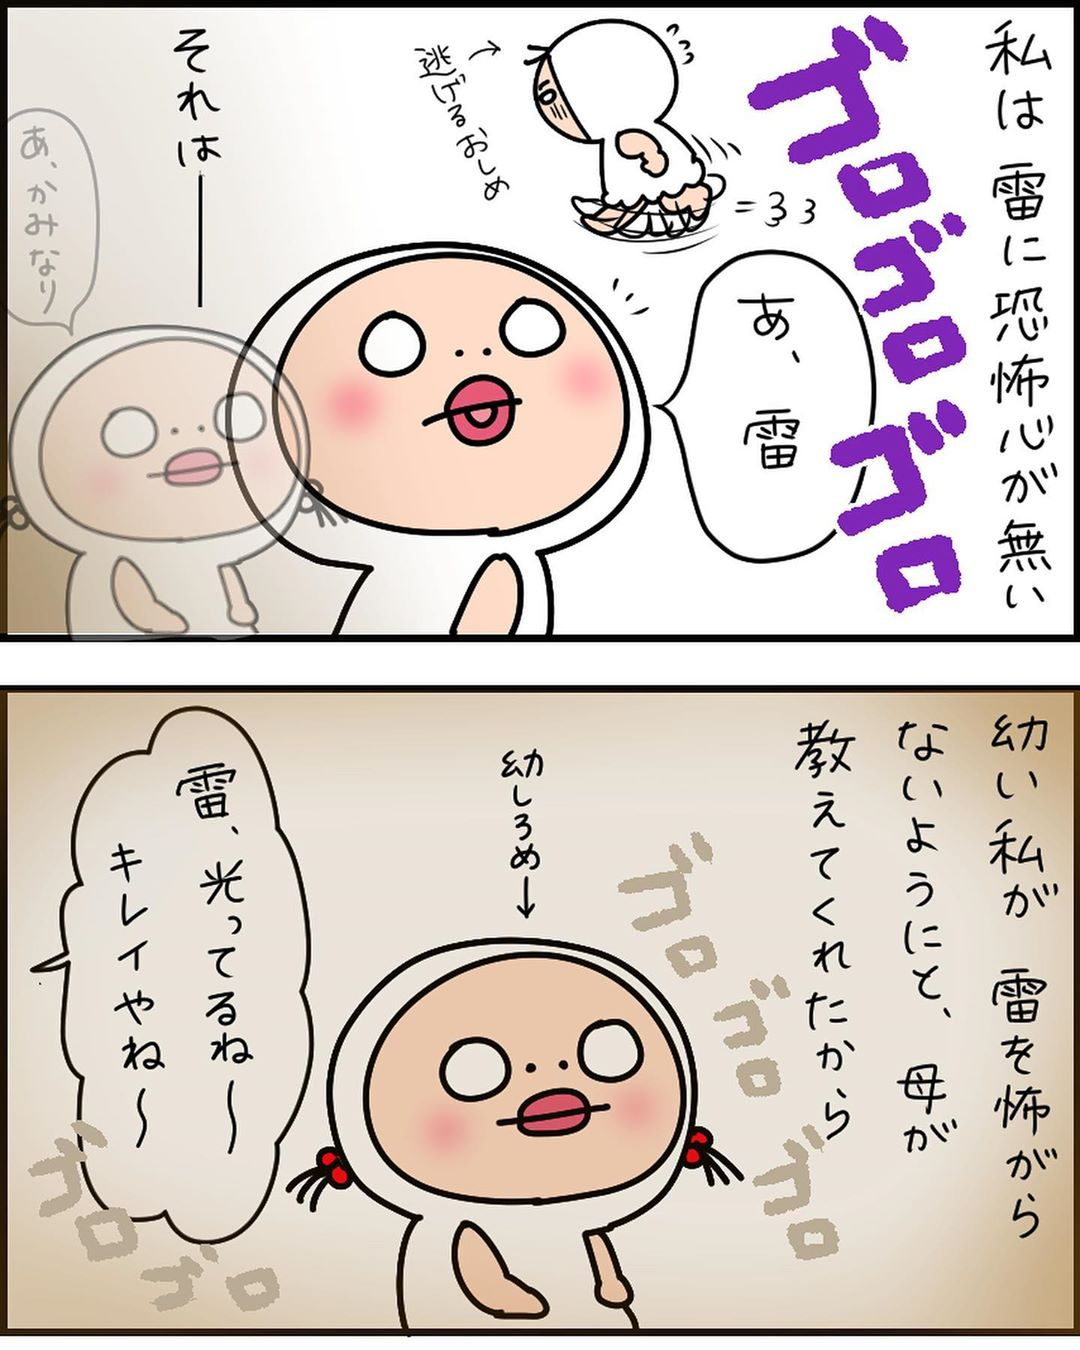 nikunohi029_64739987_458564924713350_507564058279370889_n